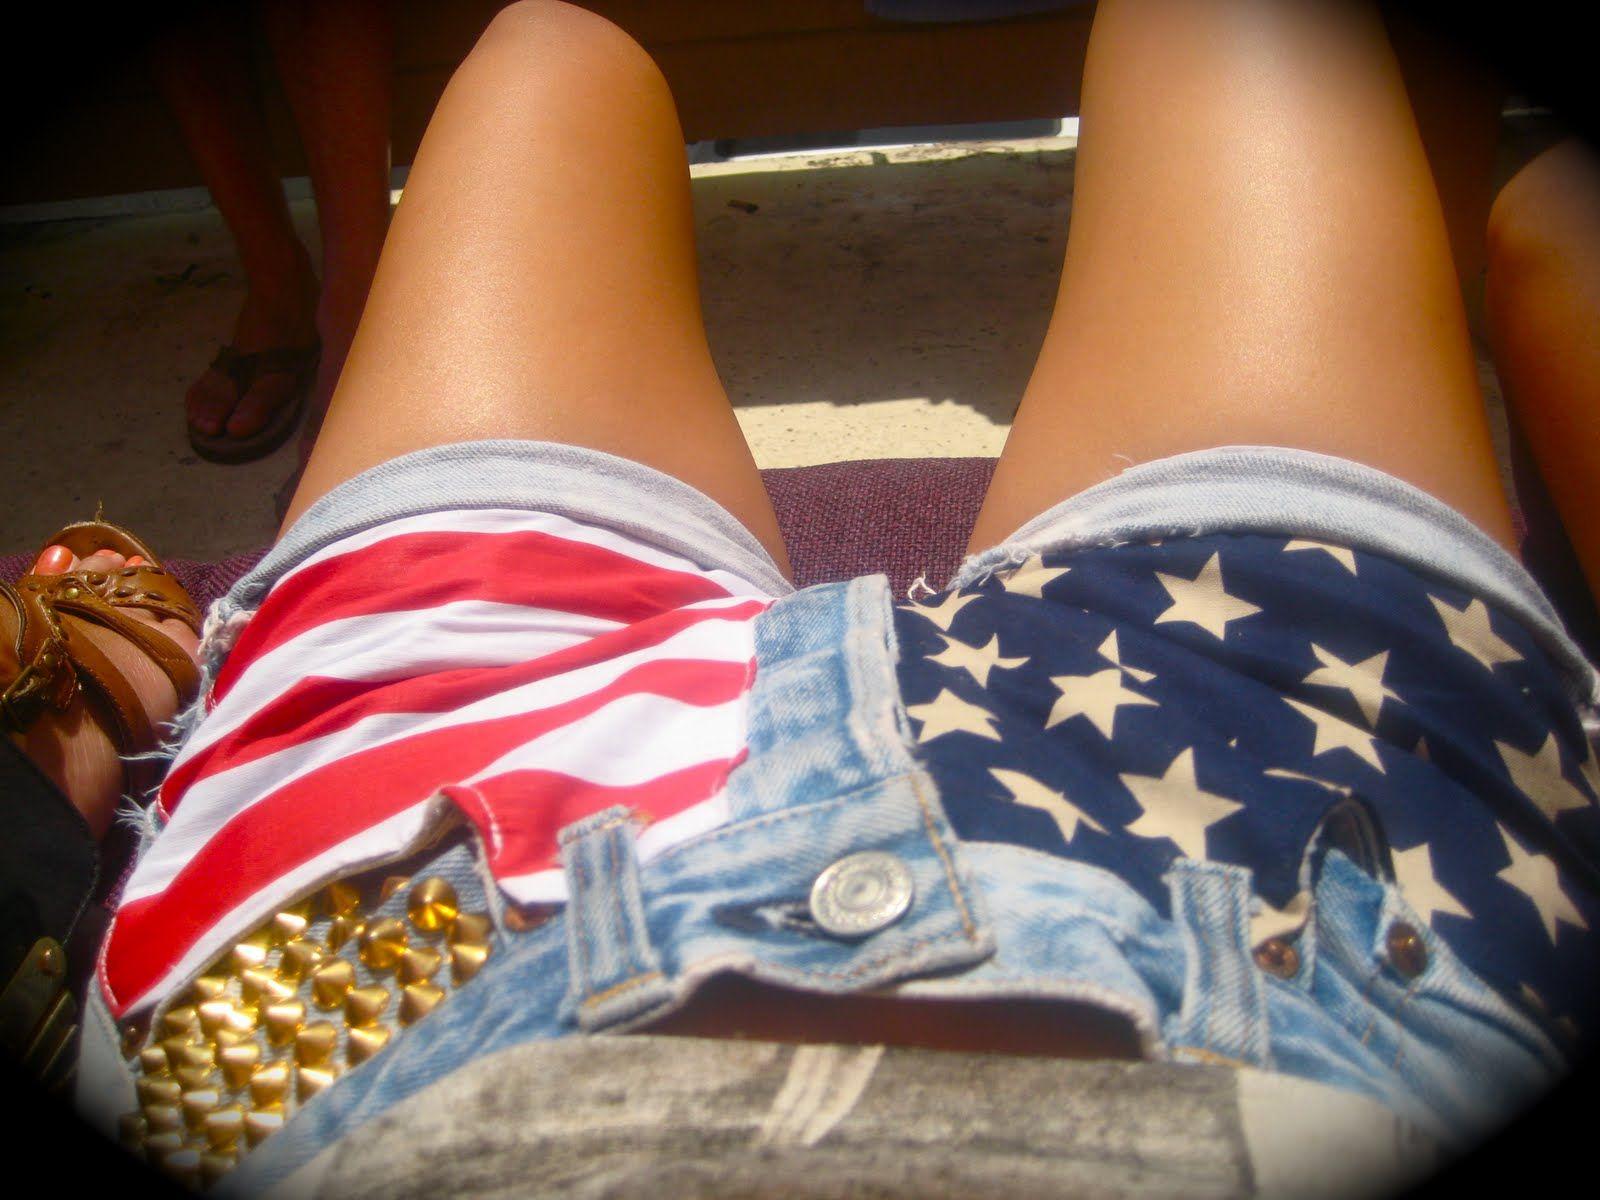 jessica+flag+shorts.JPG (1600×1200) Americana, Desnudos